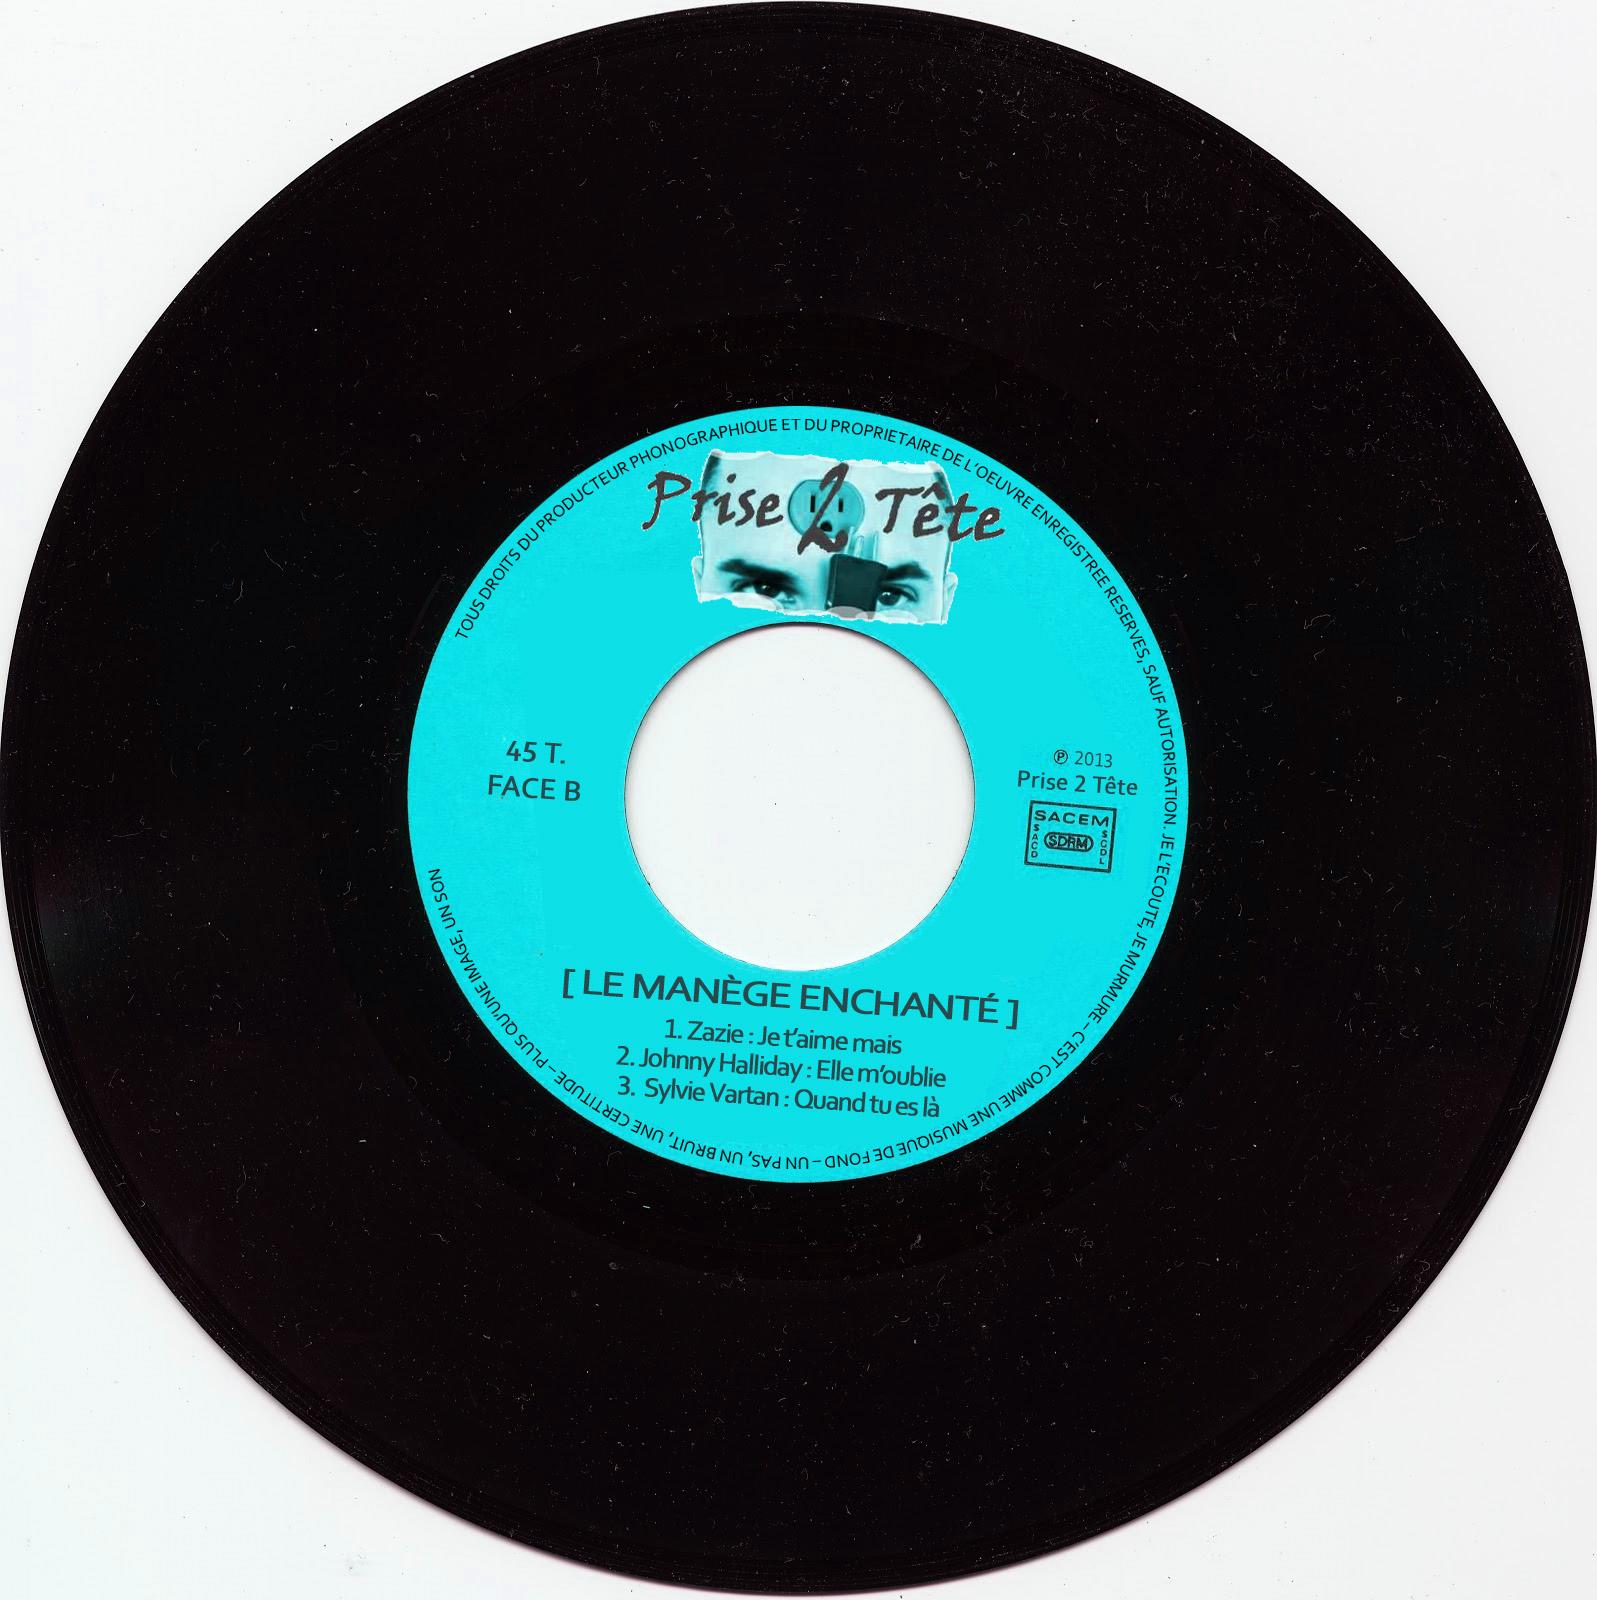 http://www.prise2tete.fr/upload/Klimrod-39-faceb.jpg